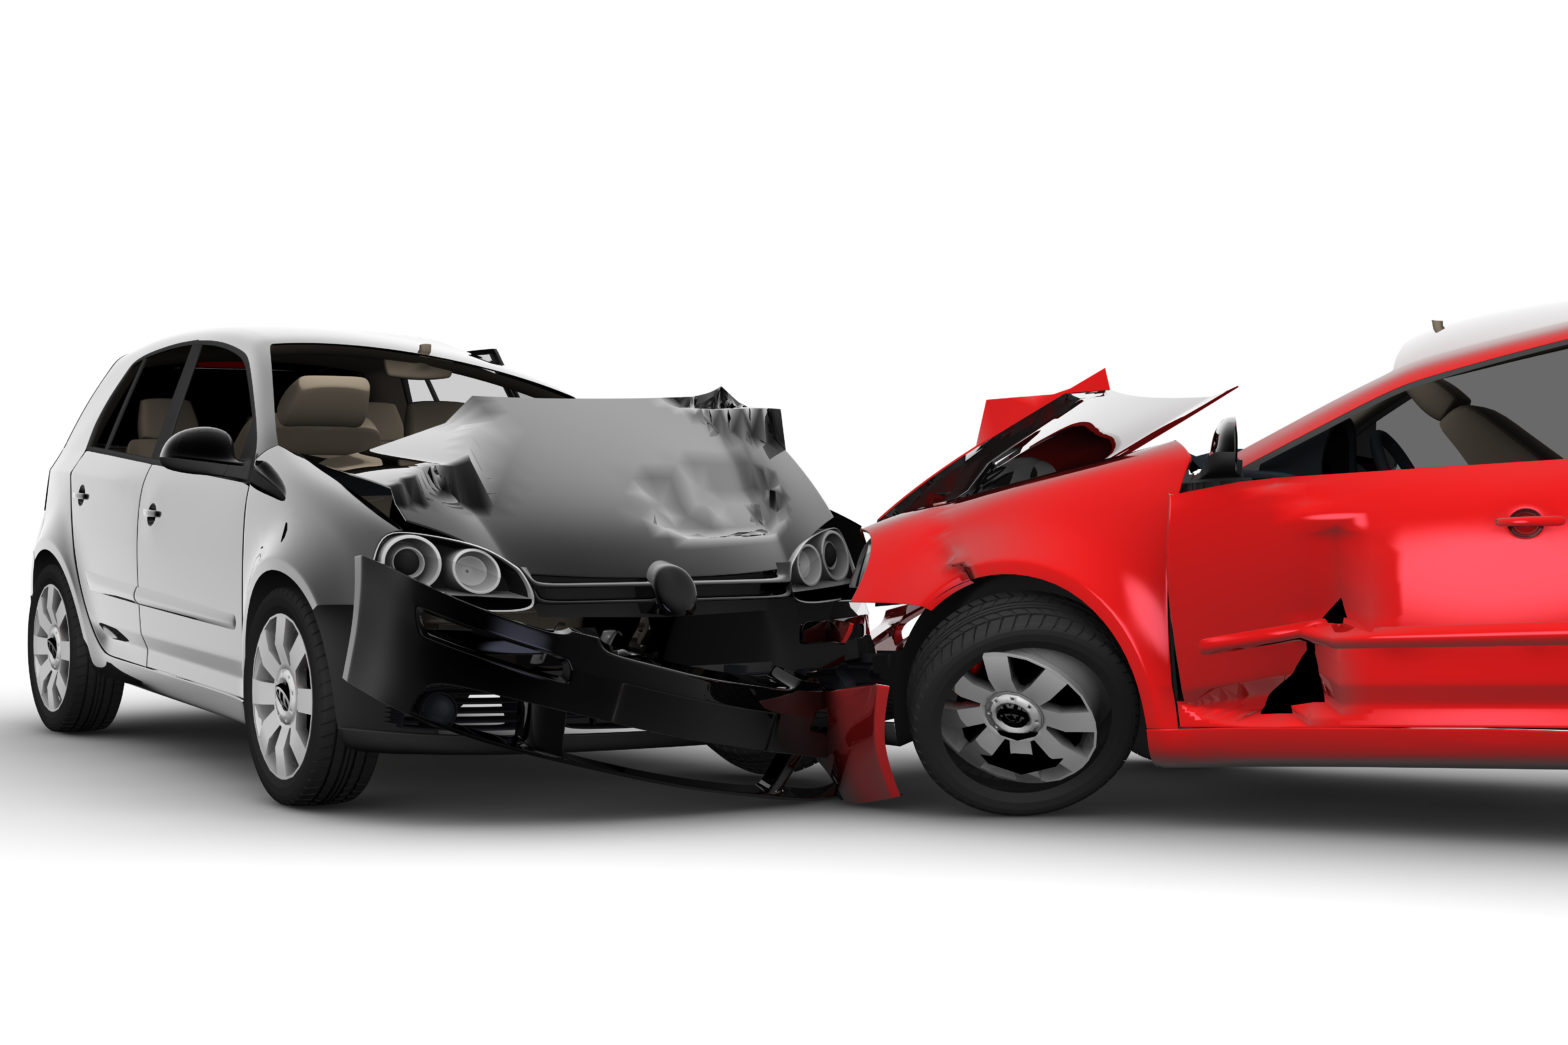 Autounfall - Was tun?